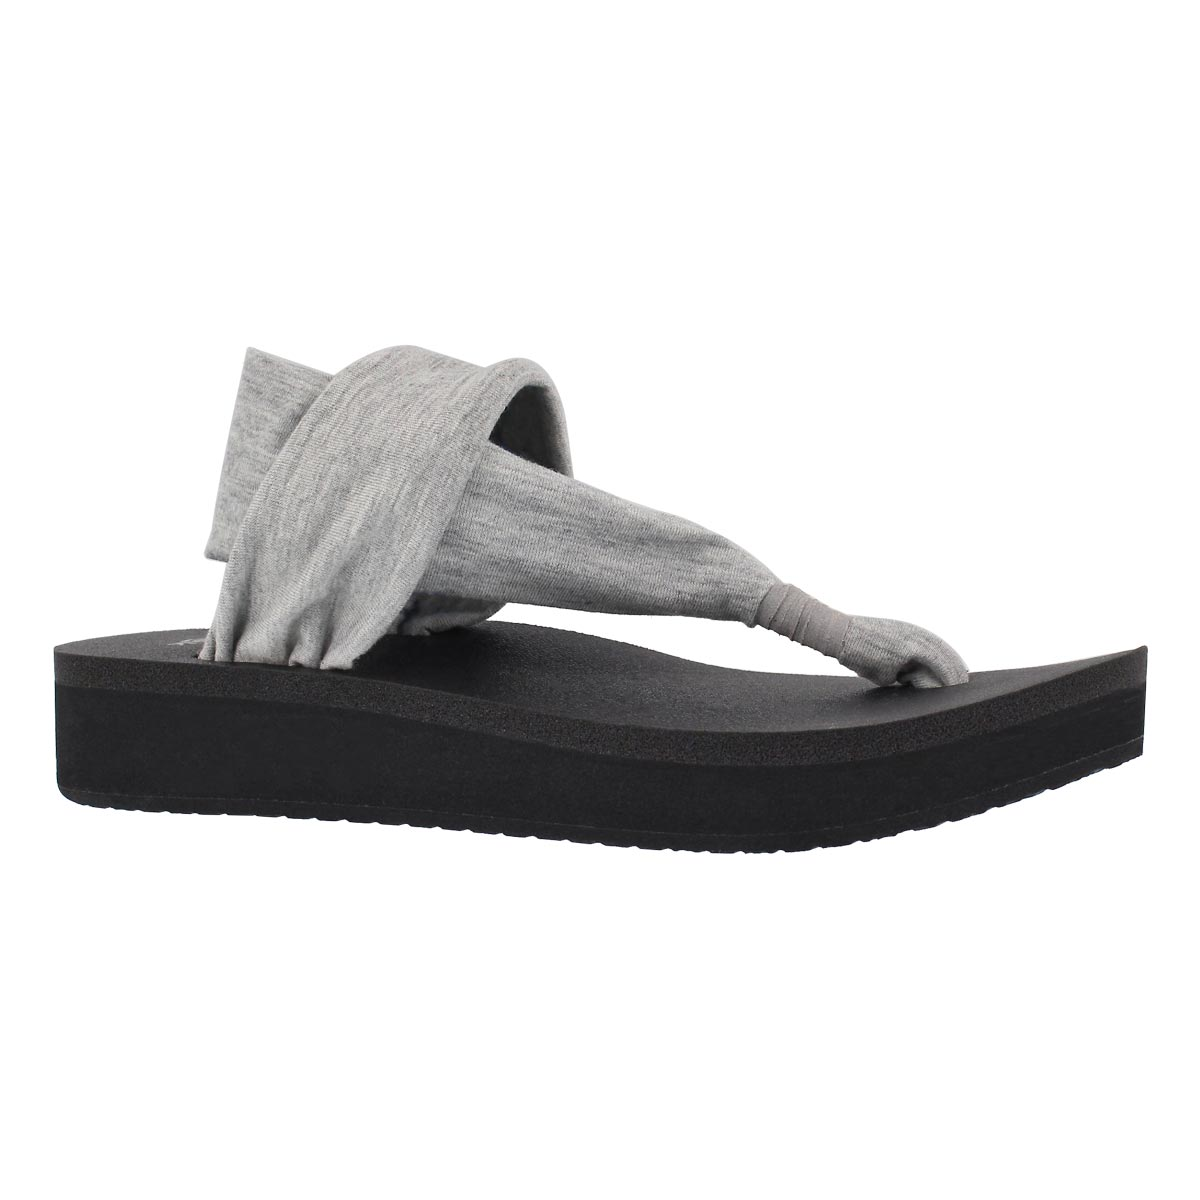 Women's YOGA SLING grey thong wedge sandals